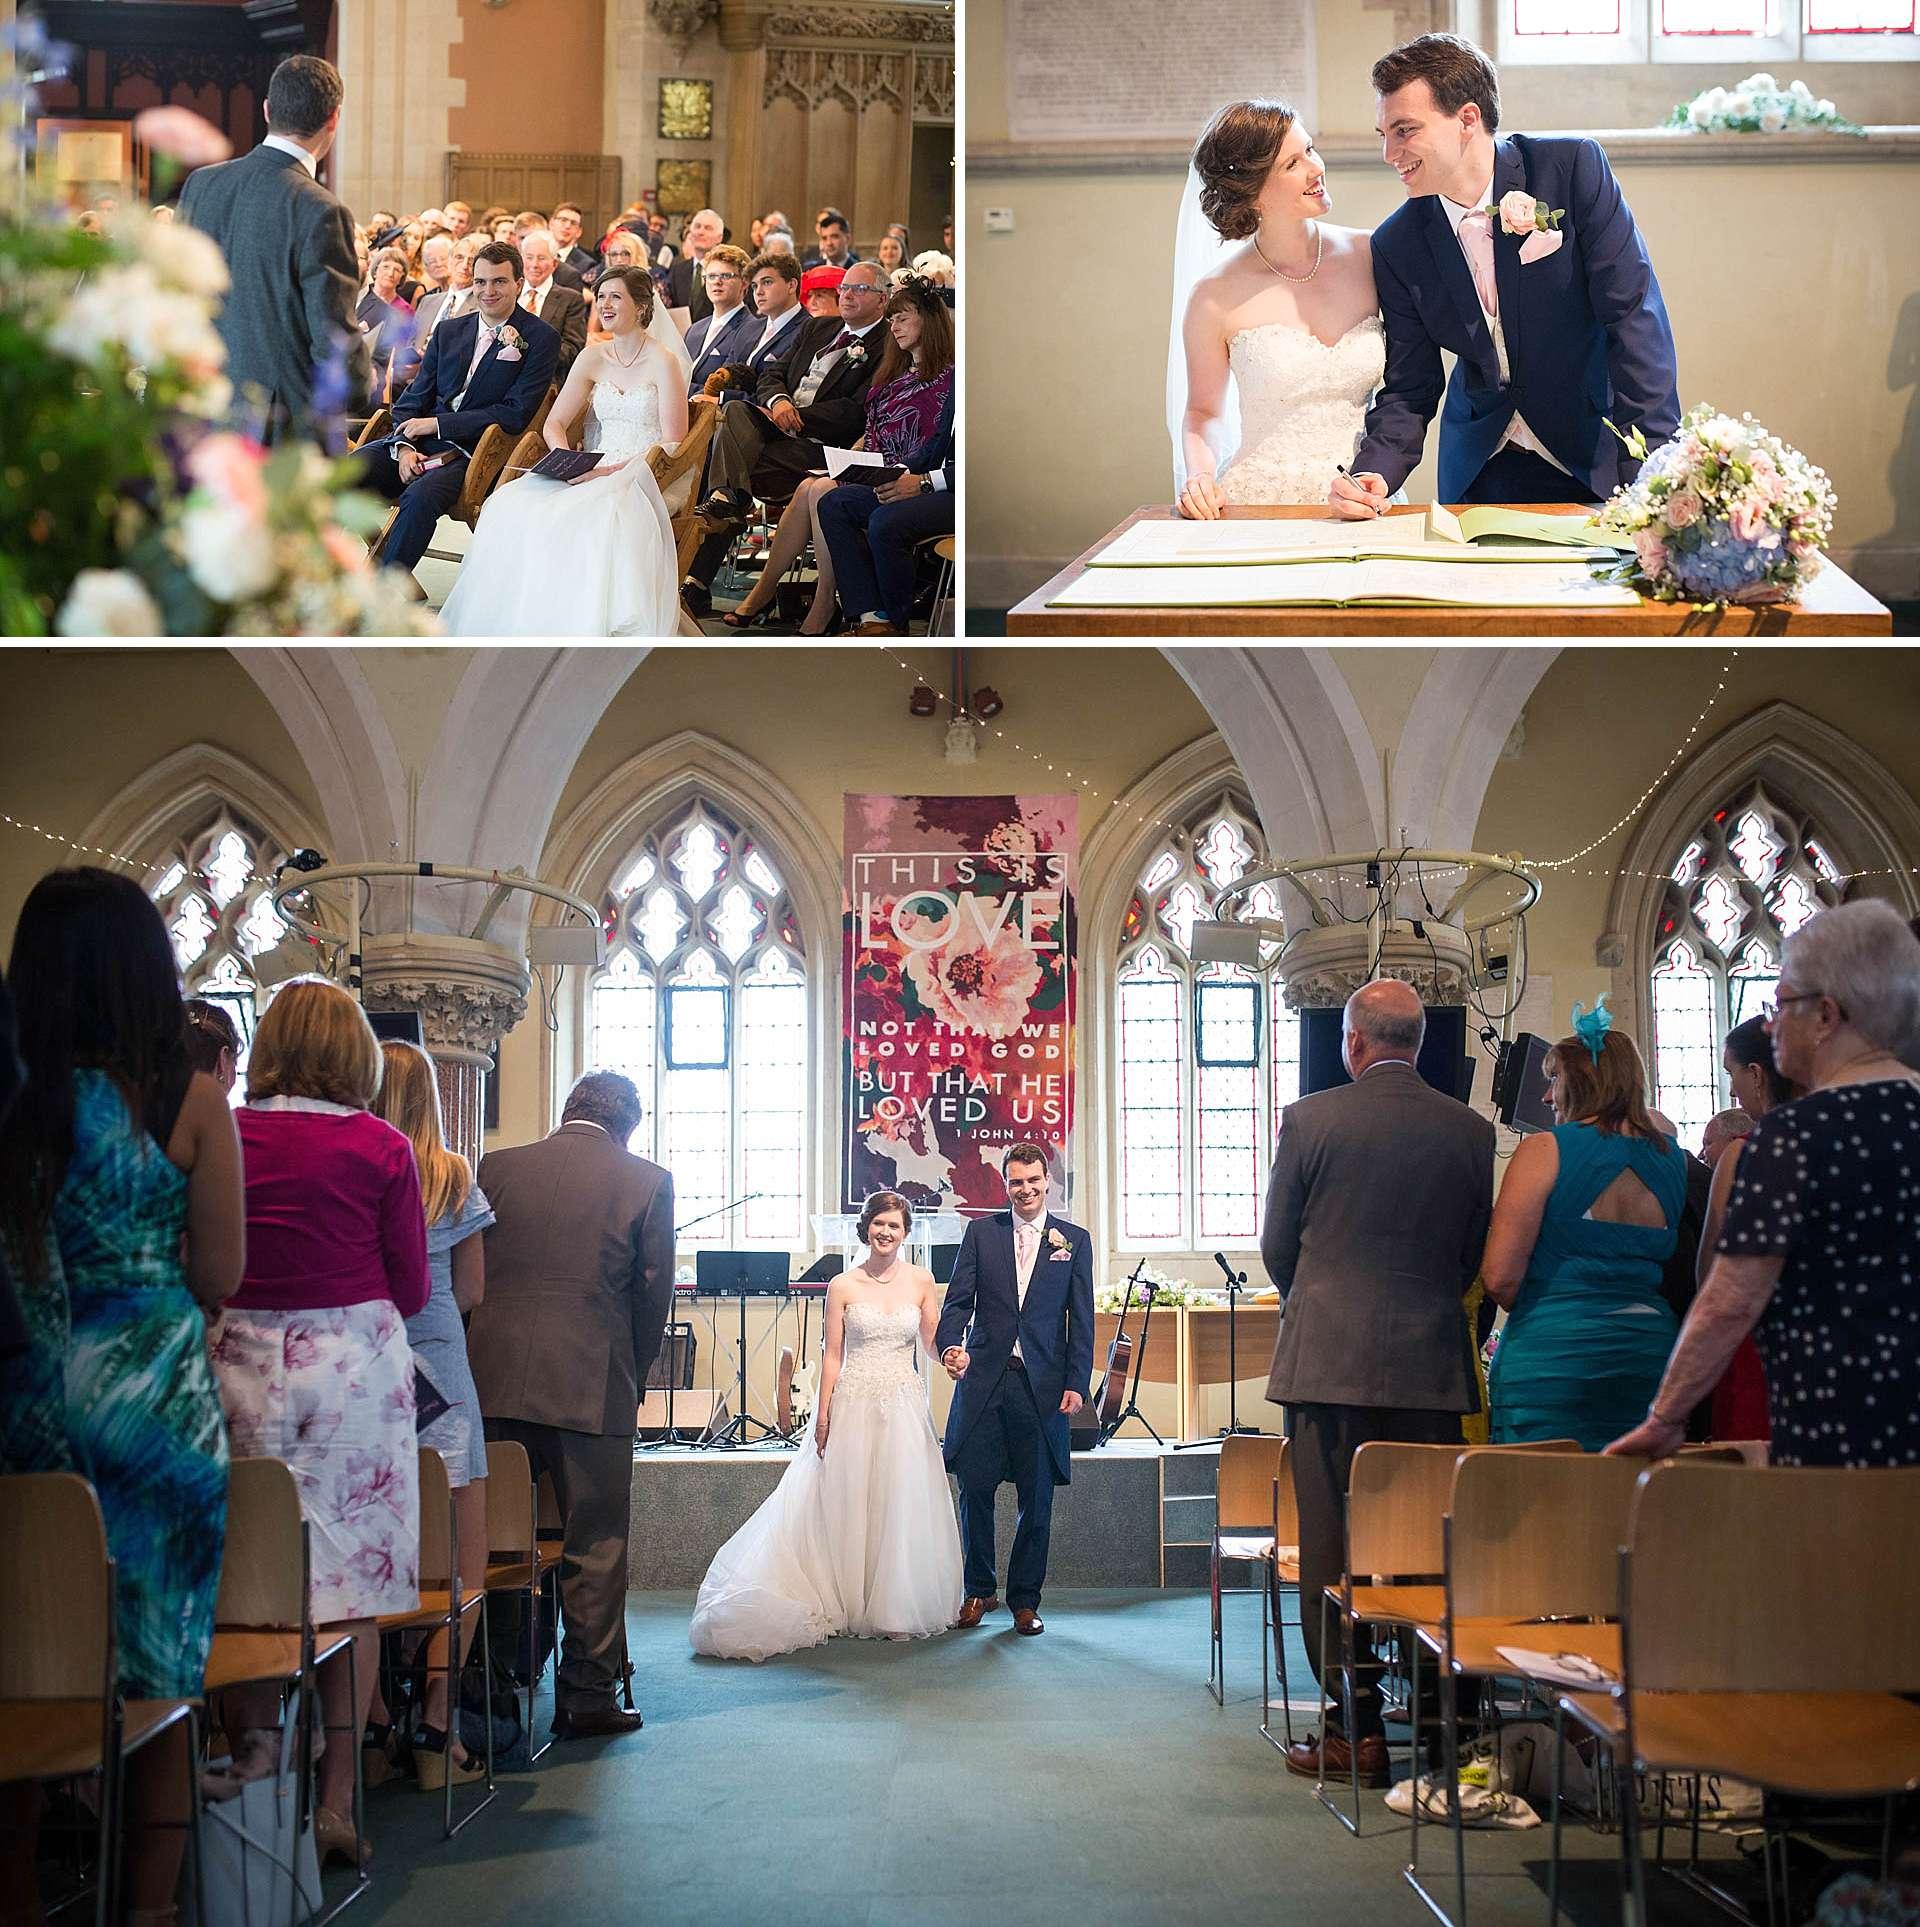 Average Wedding Photographer Cost Uk 2017: Charlotte And Pete